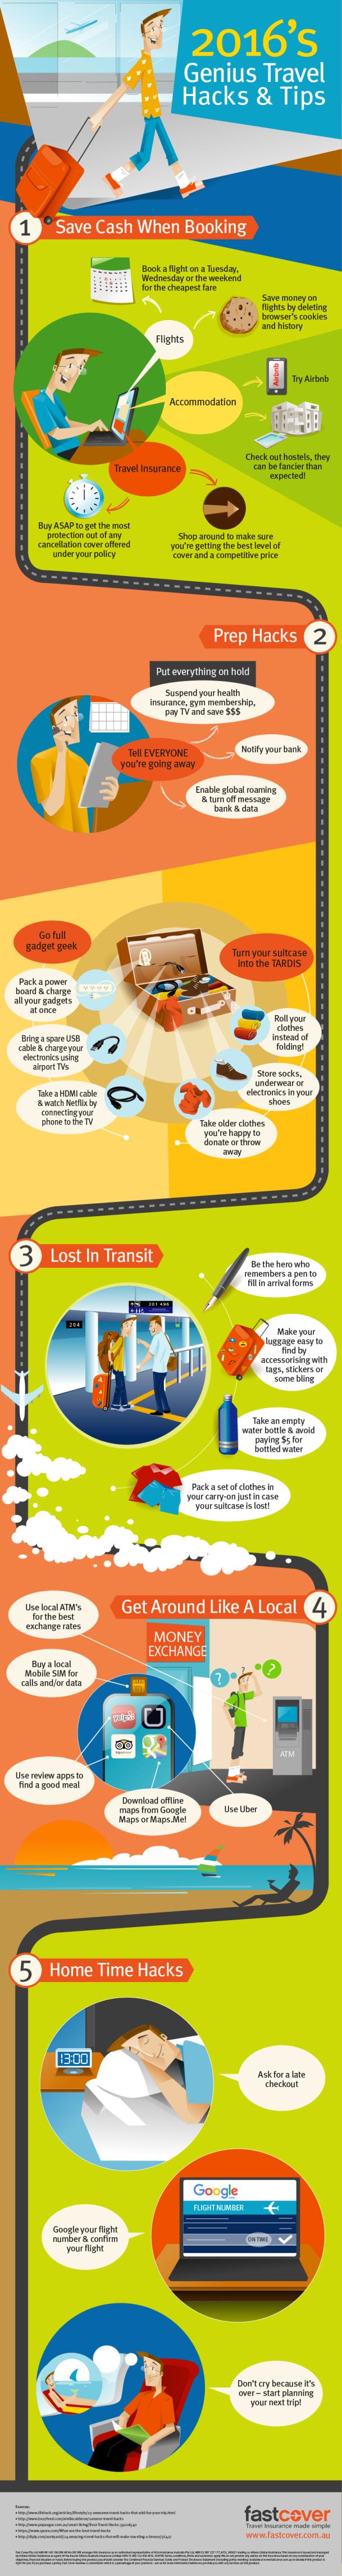 genius travel hacks & tips - better saving experience in 2016